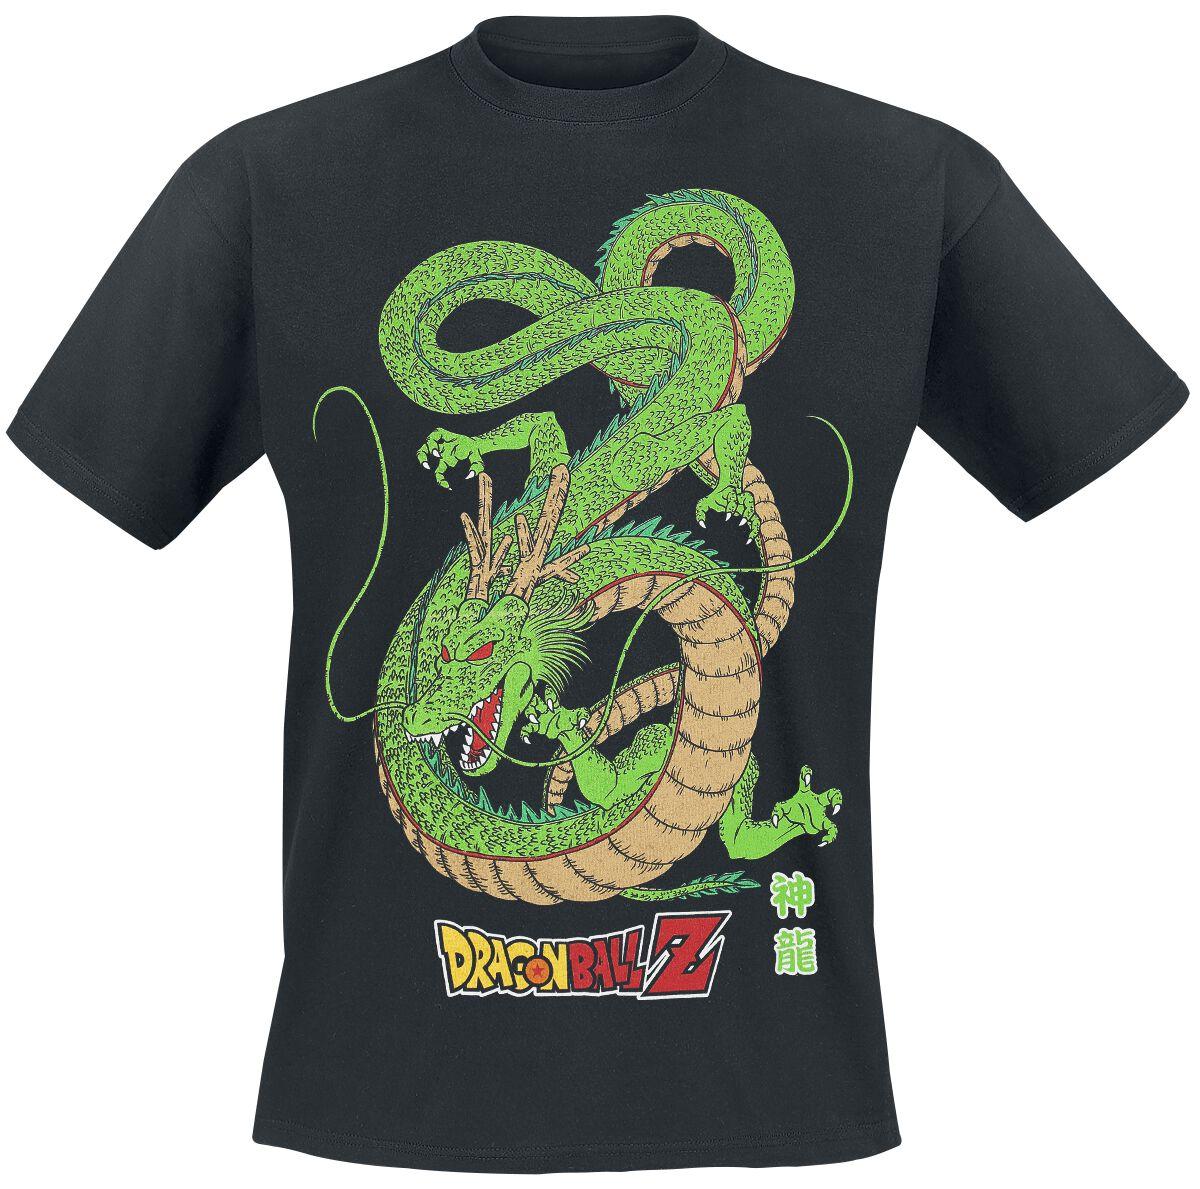 Merch dla Fanów - Koszulki - T-Shirt Dragon Ball Z - Shenron T-Shirt czarny - 352523